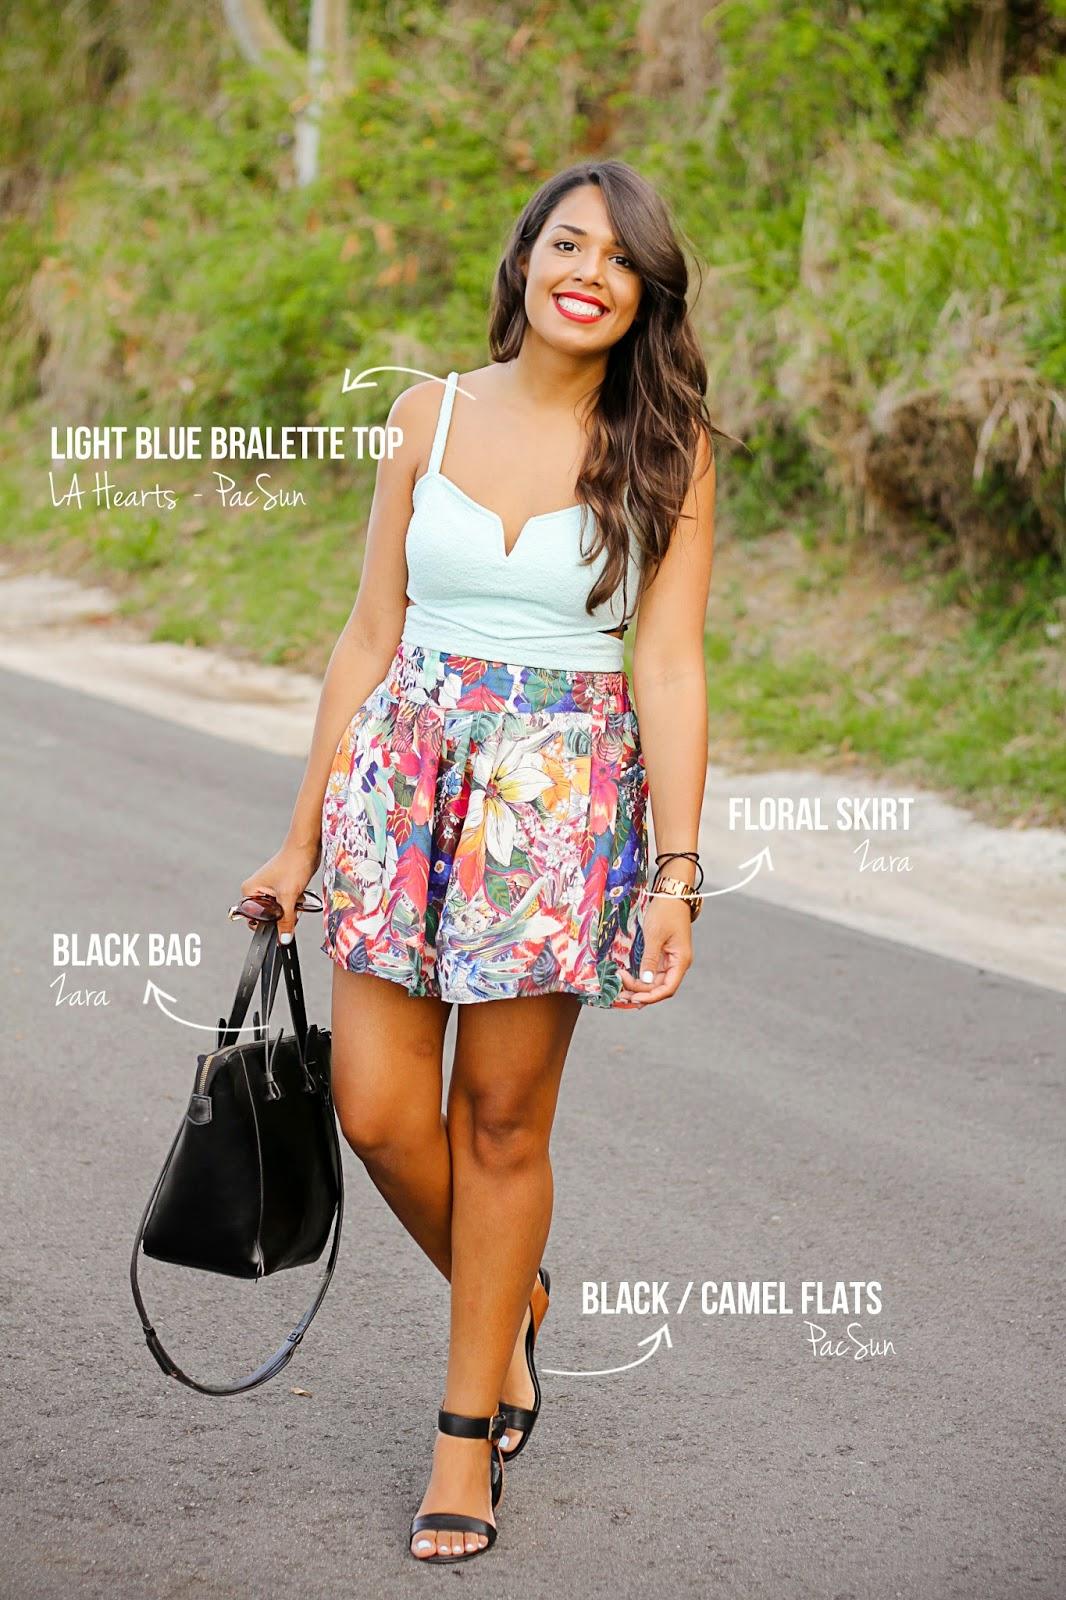 c8f827be91 Bralette Top - PACSUN   Floral Skirt - Zara (similar) · Black Bag ...